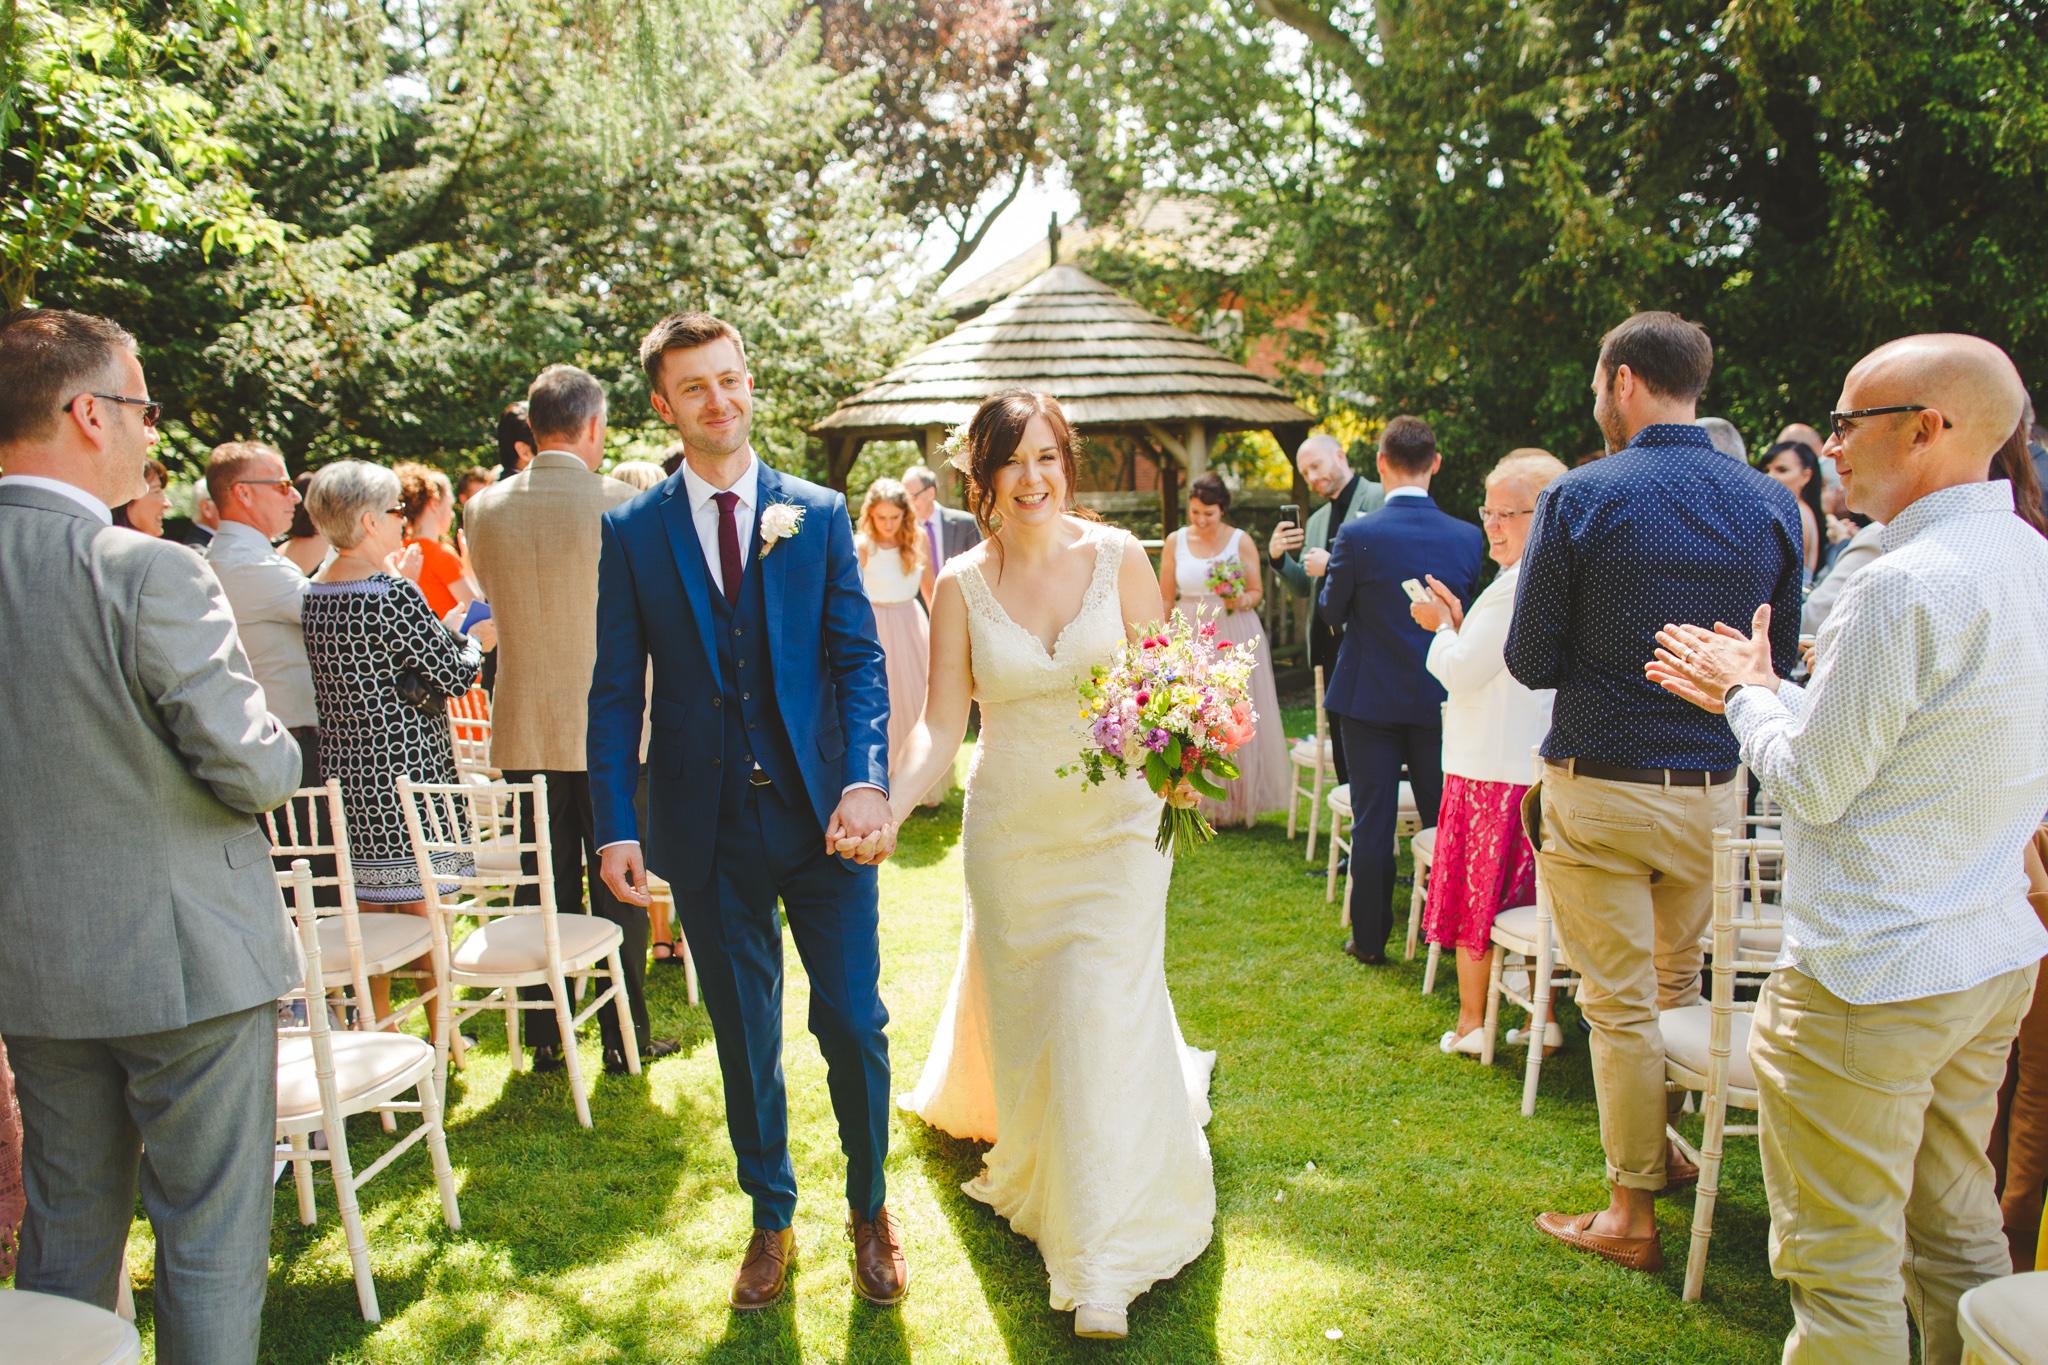 derbyshire-wedding-photographer-videographer-camera-hannah-45.jpg